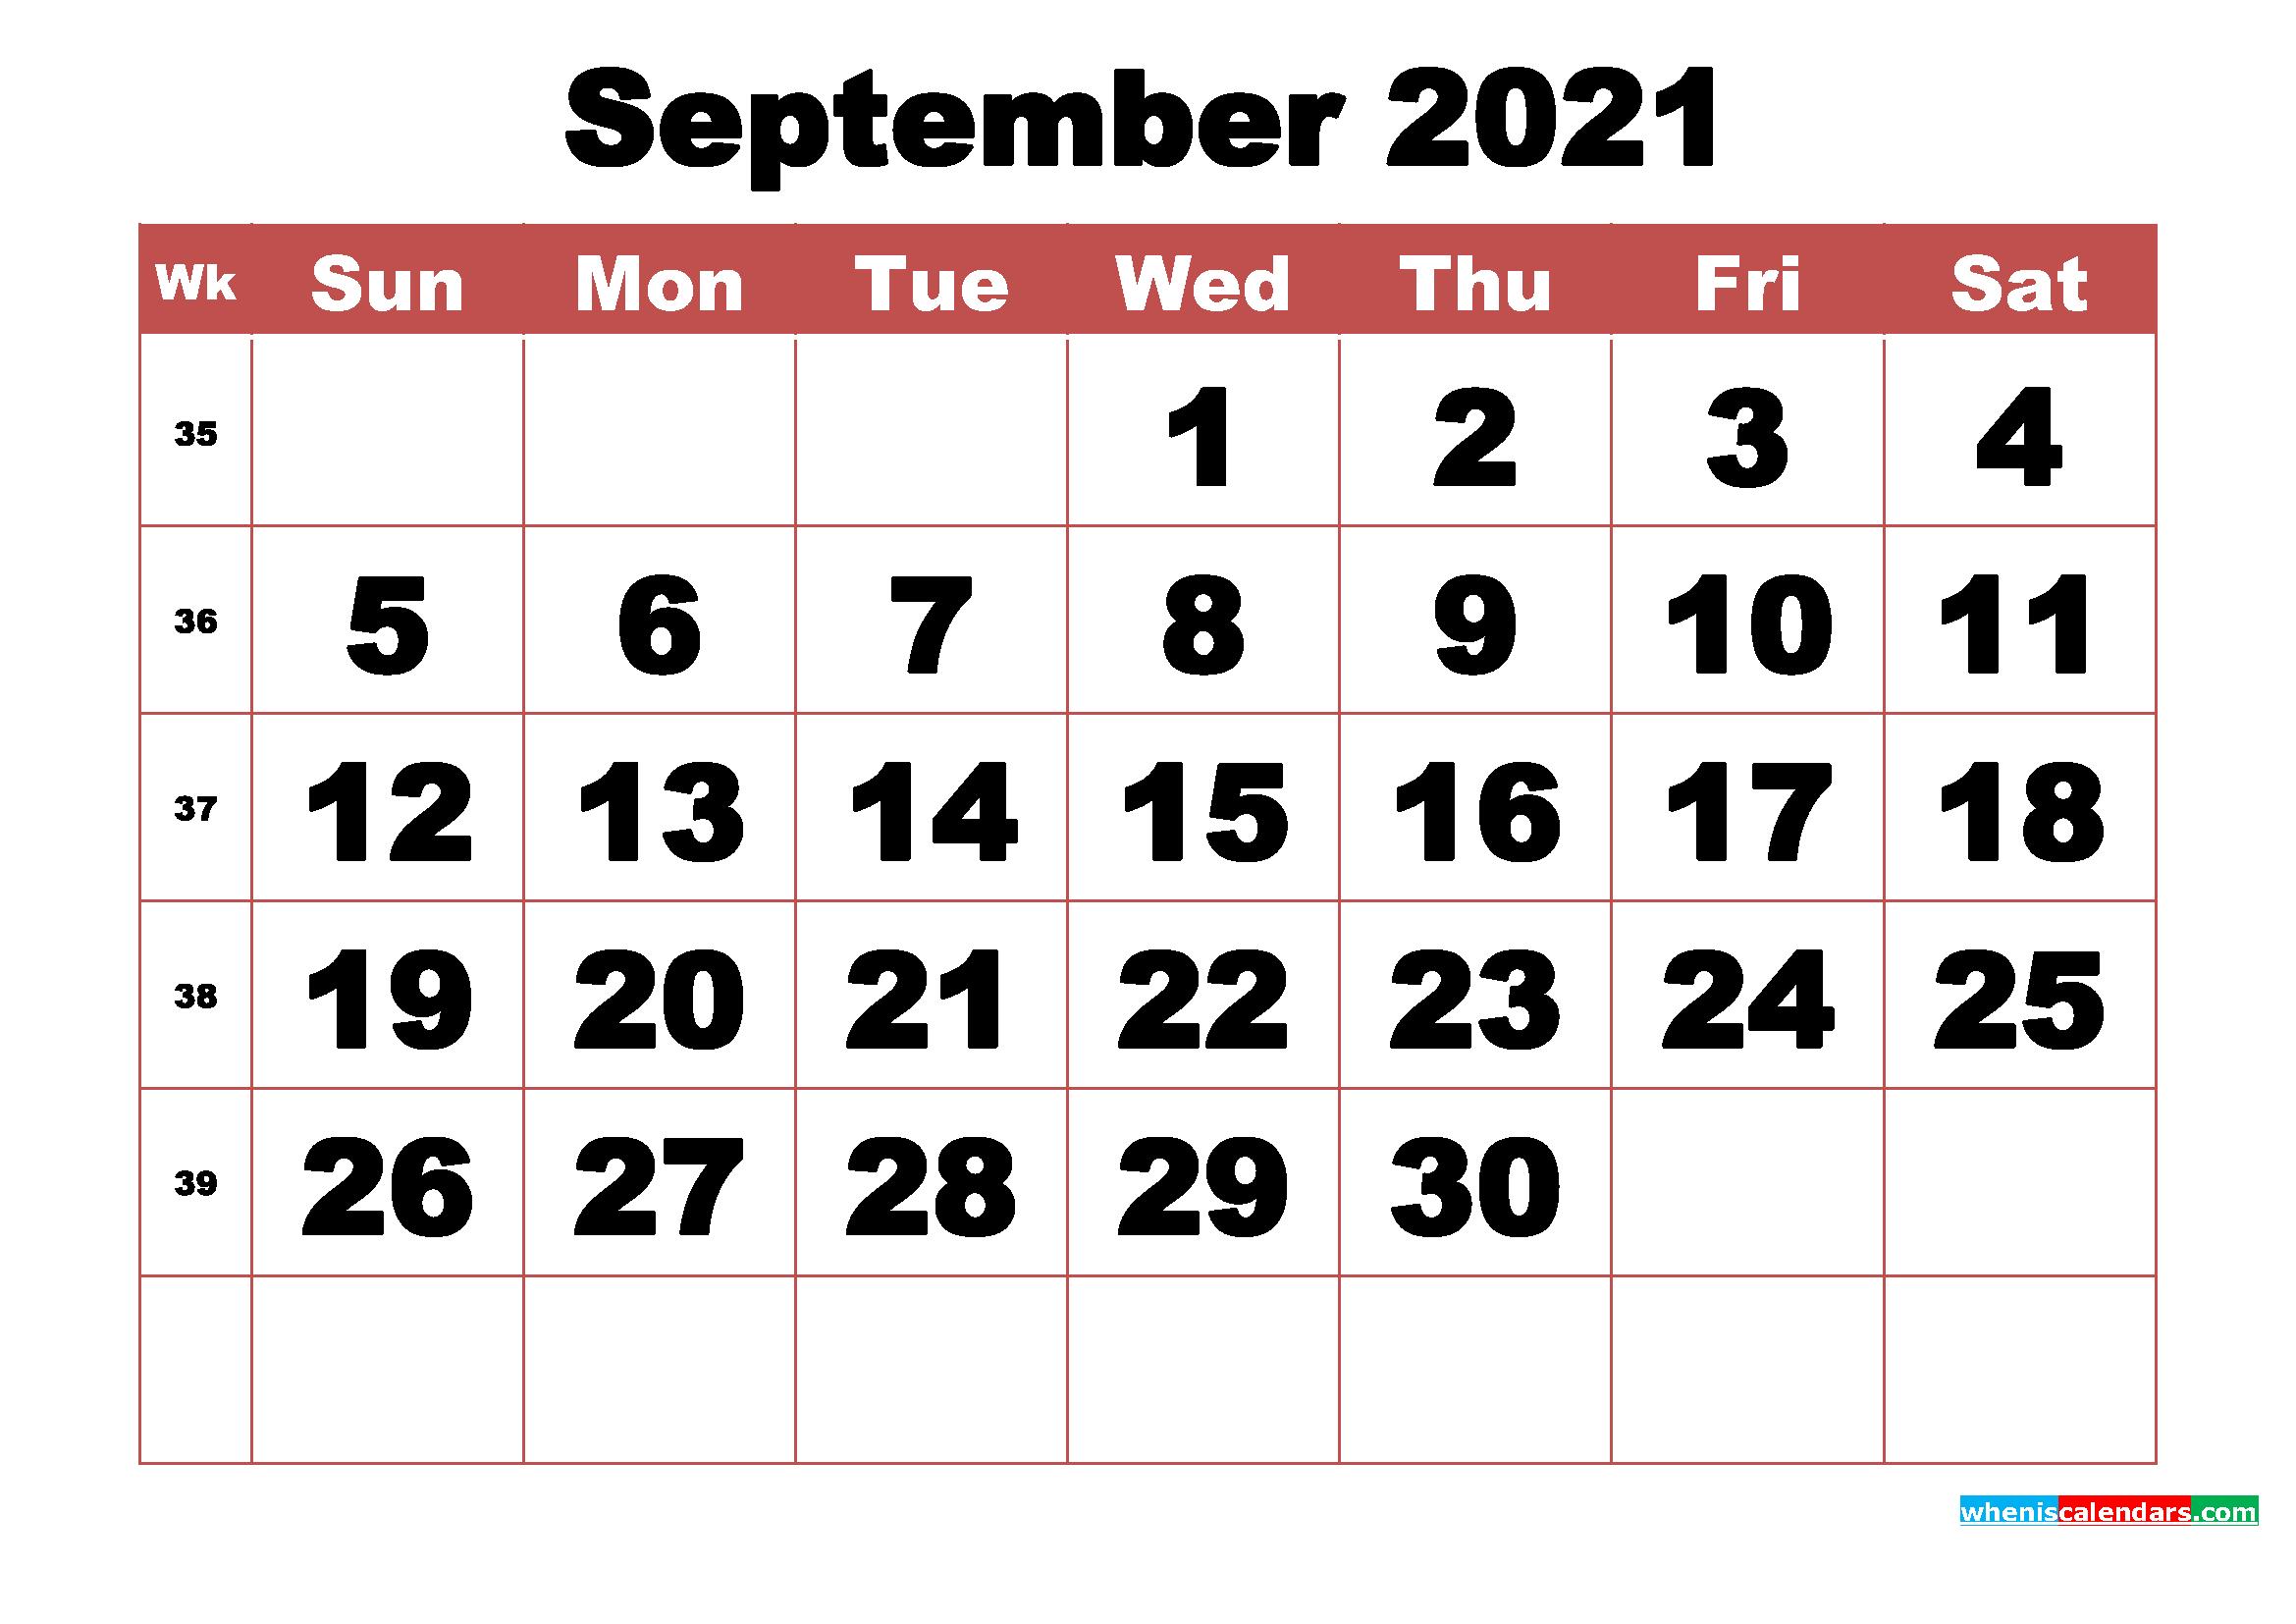 Free Printable September 2021 Calendar With Week Numbers-3 Month Printable Calendar Templates 2021